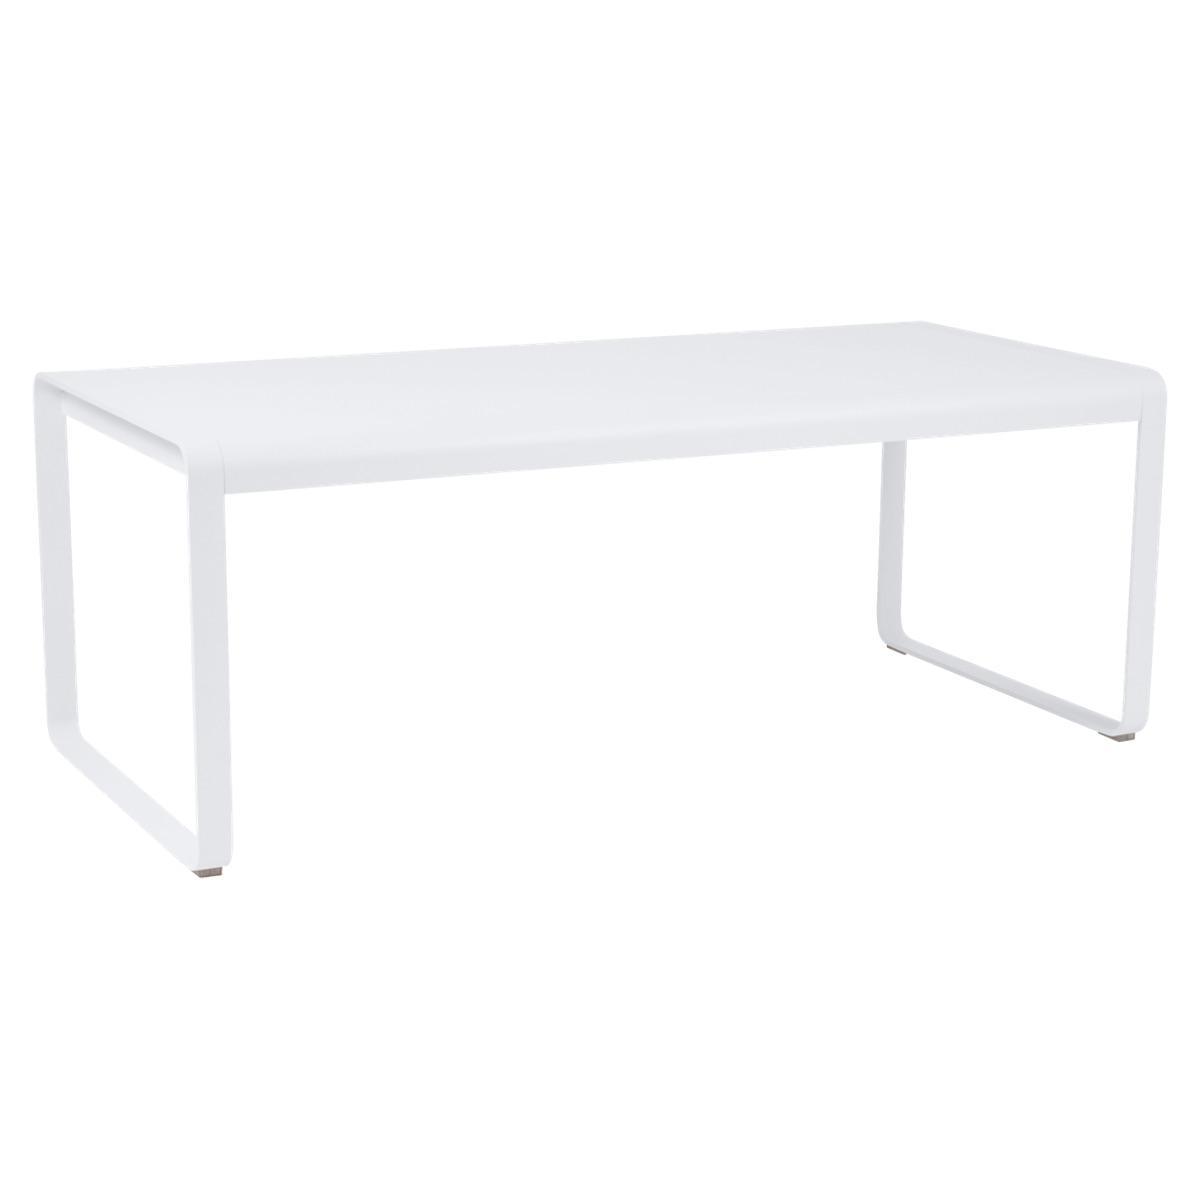 Table 90x196cm BELLEVIE PREMIUM Fermob blanc coton